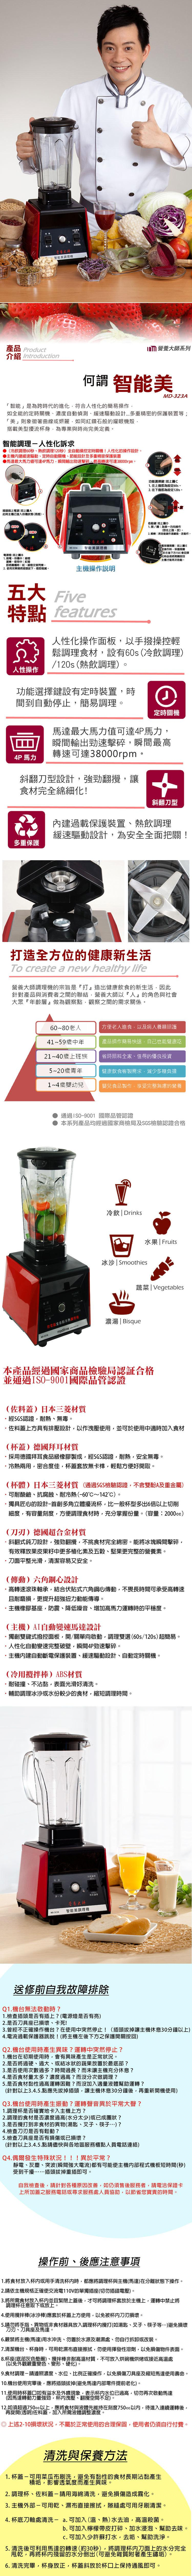 Nutrition Master 營養大師 MD-323A 智能美調理機 - 台灣製